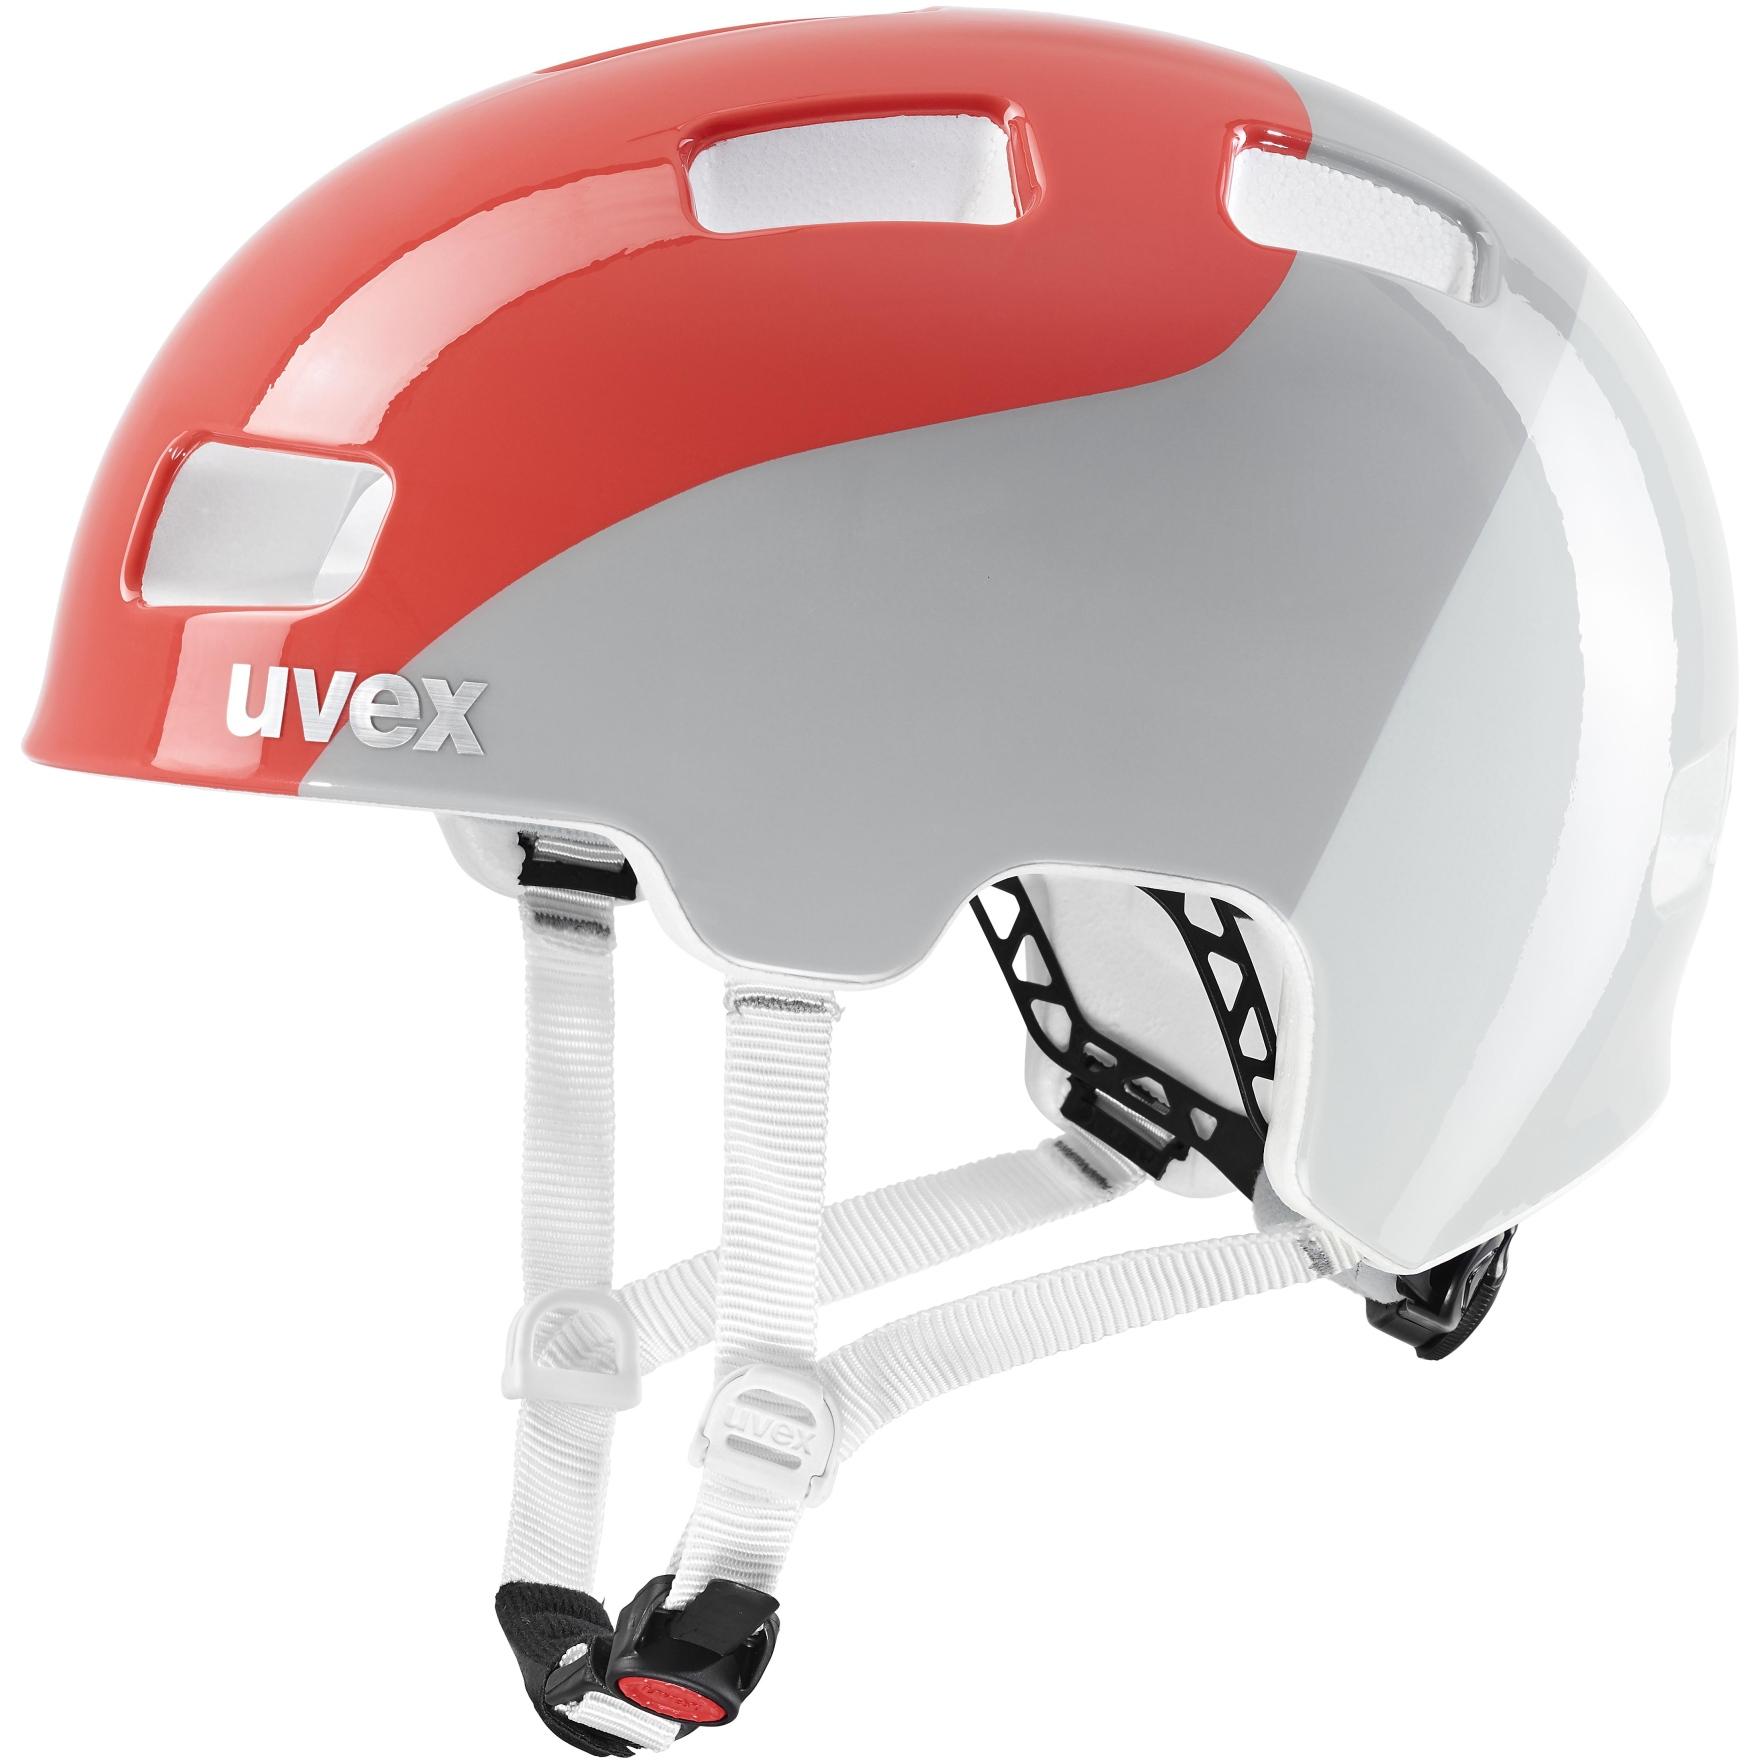 Uvex hlmt 4 Kids Helmet - grapefruit-grey wave